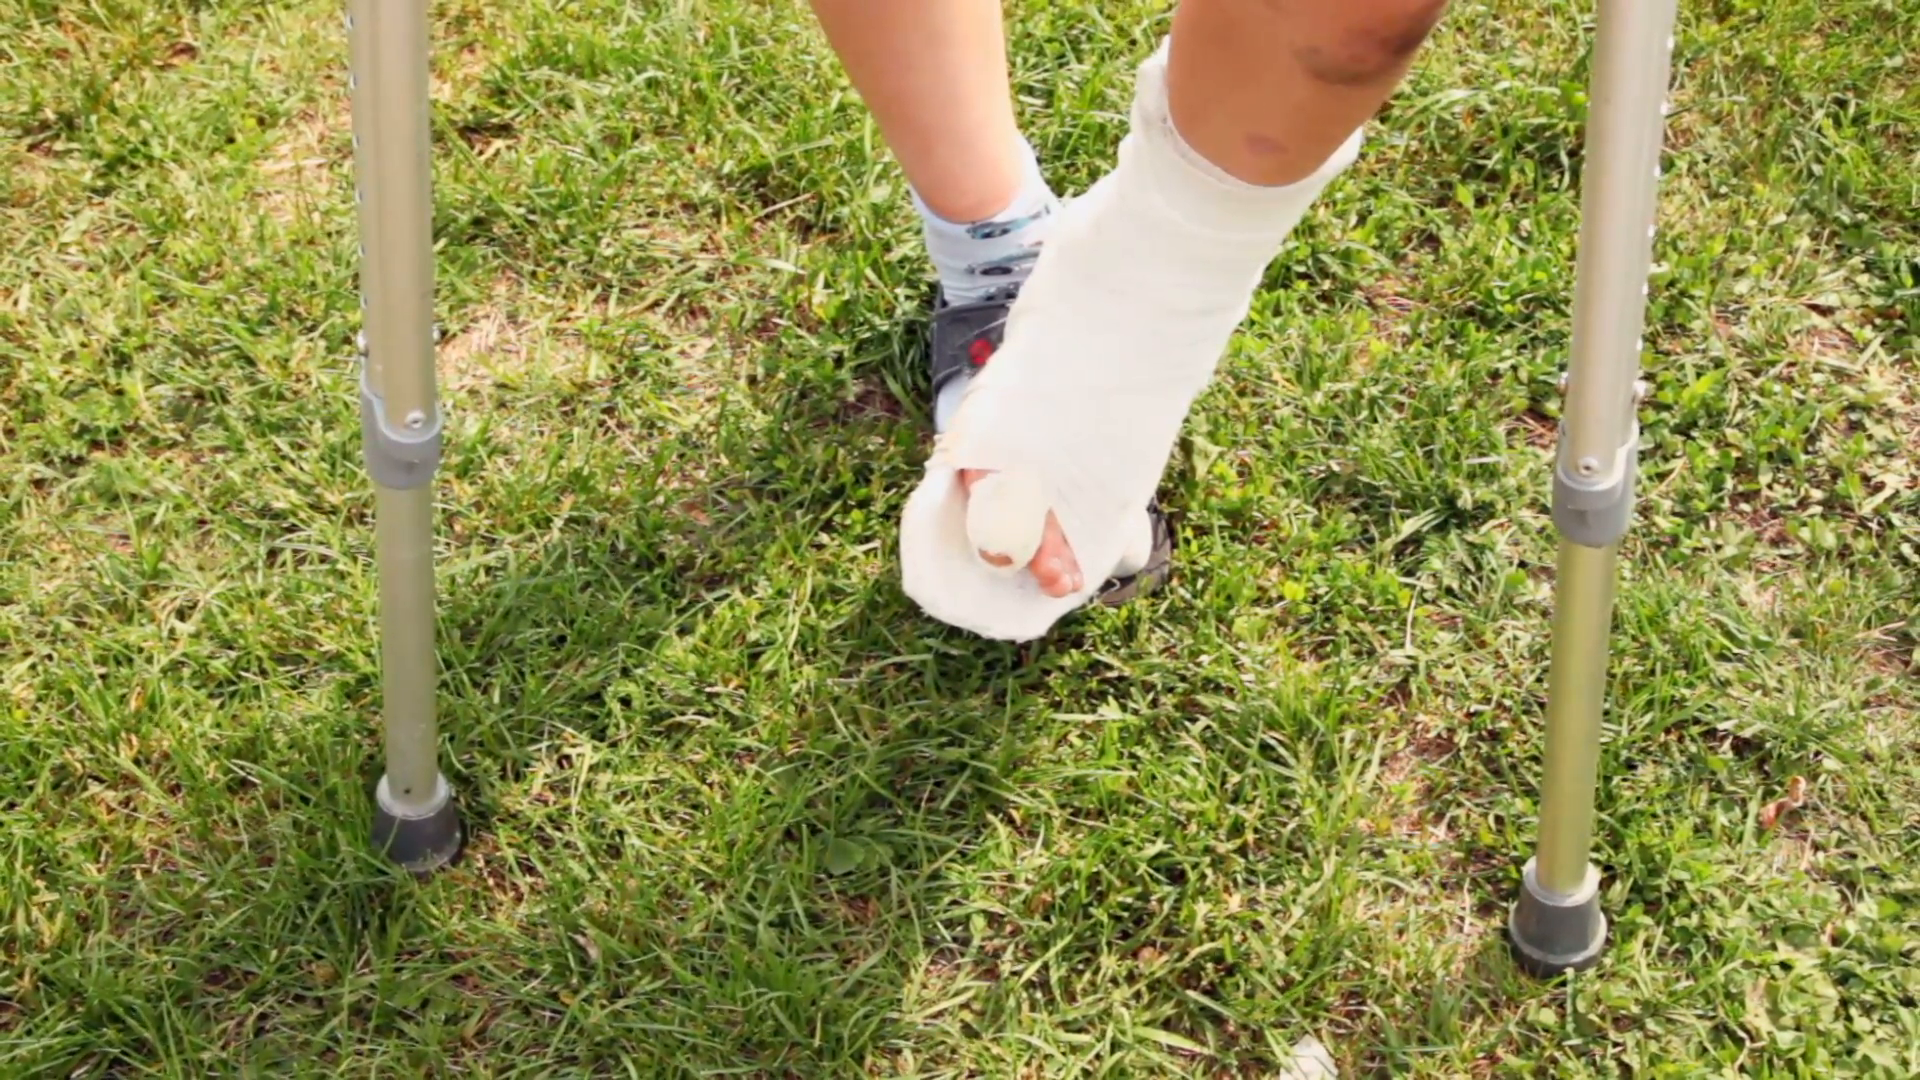 Broken Leg PNG HD - 120550